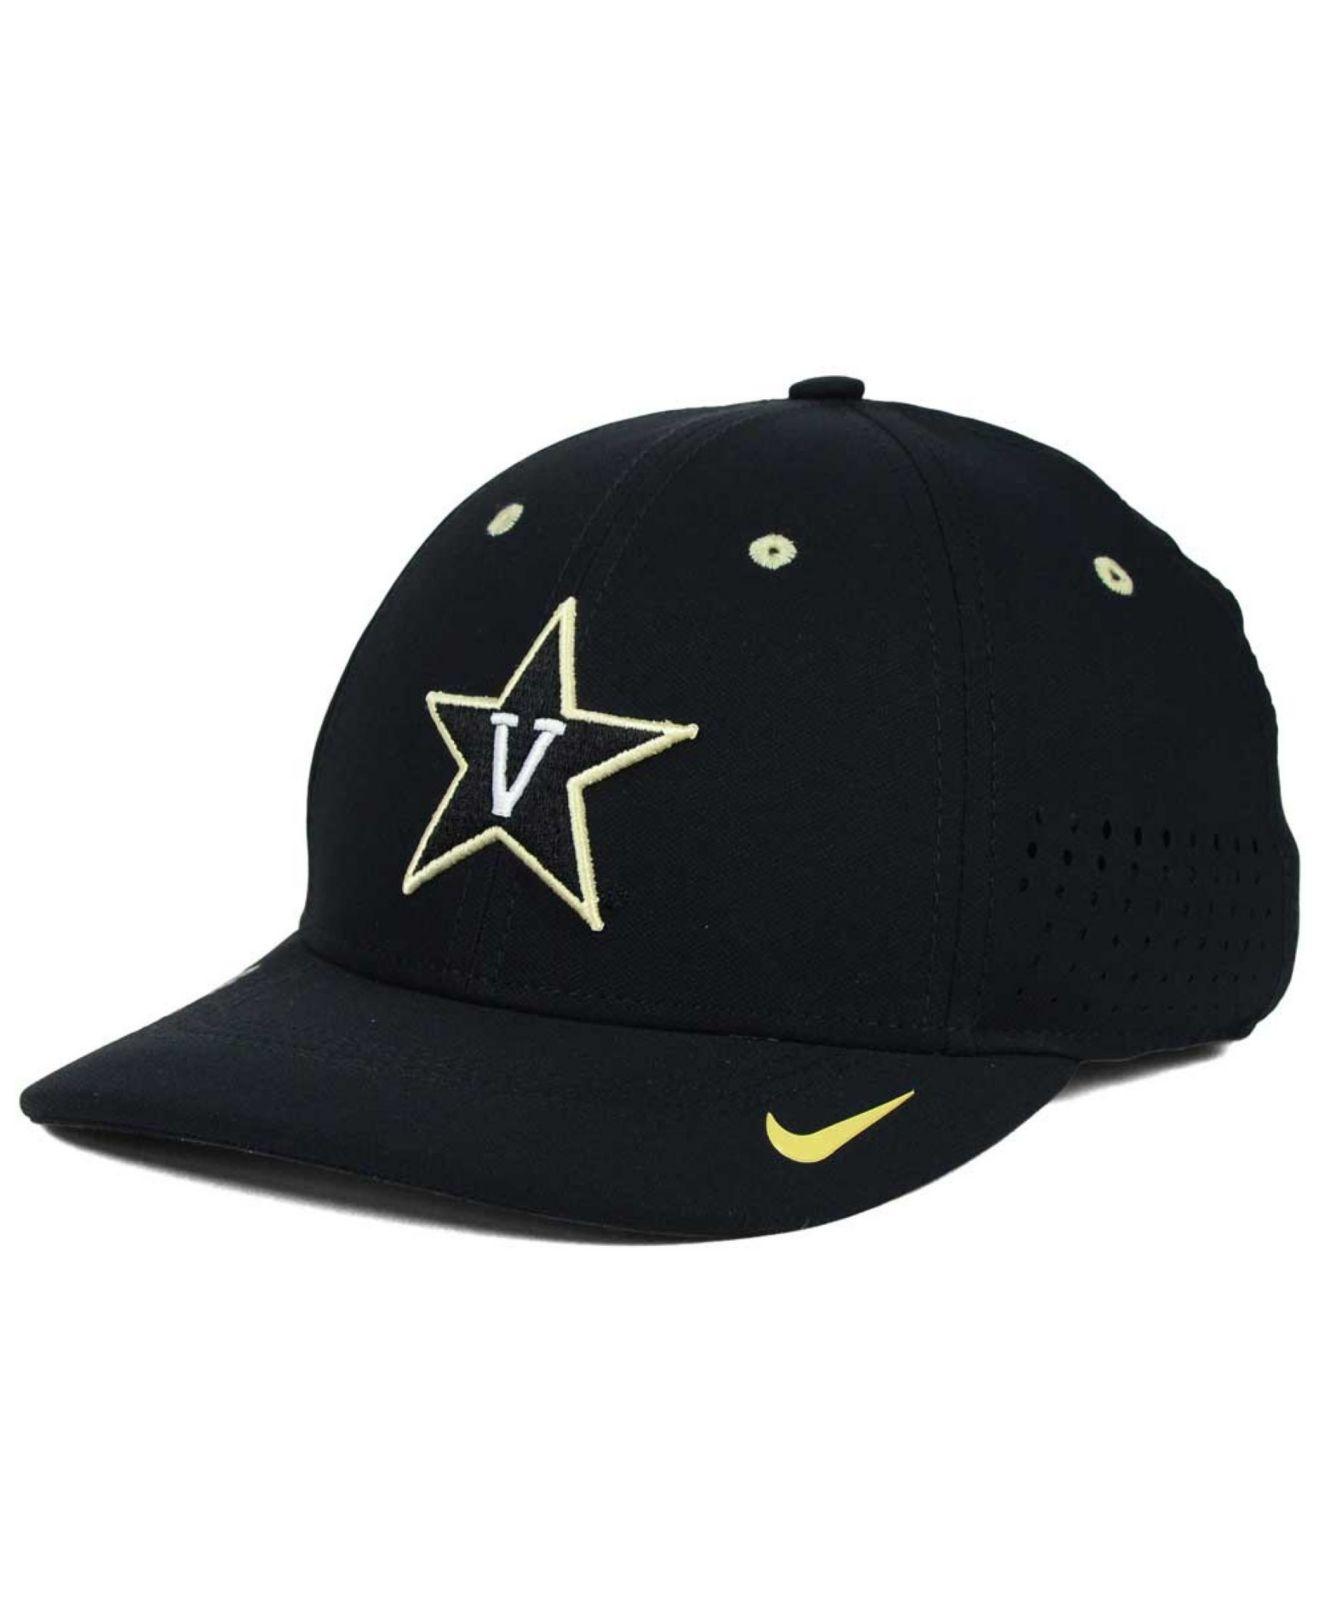 Lyst Nike Vanderbilt Modores Sideline Cap In Black For Men 8785968a79b4